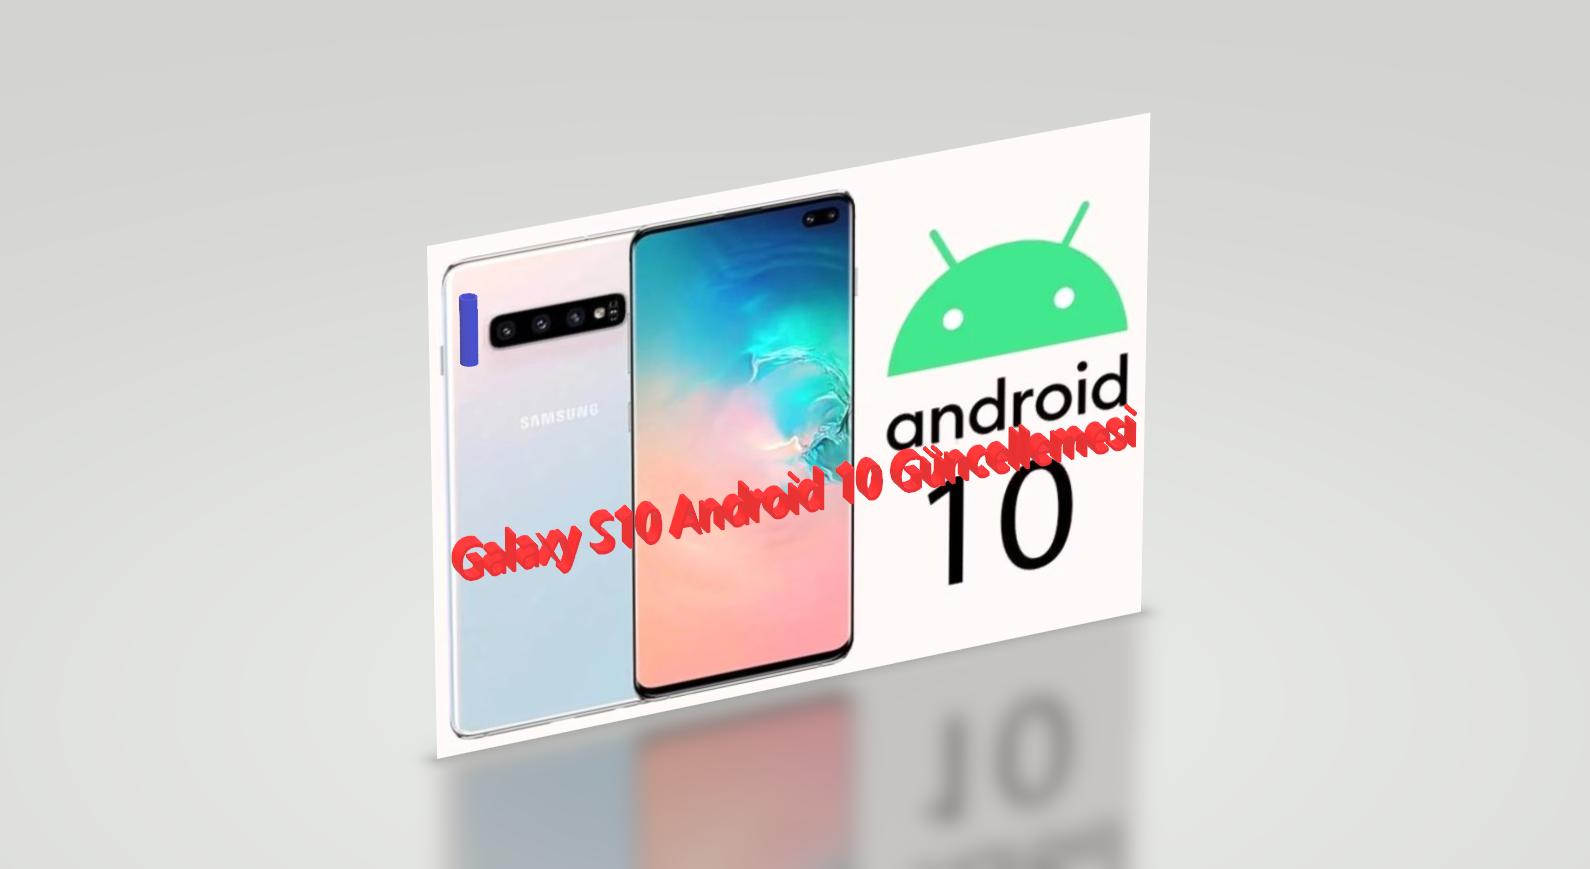 Samsun Galaxy 10 Android 10 Güncellemesi Yüklenecekmi